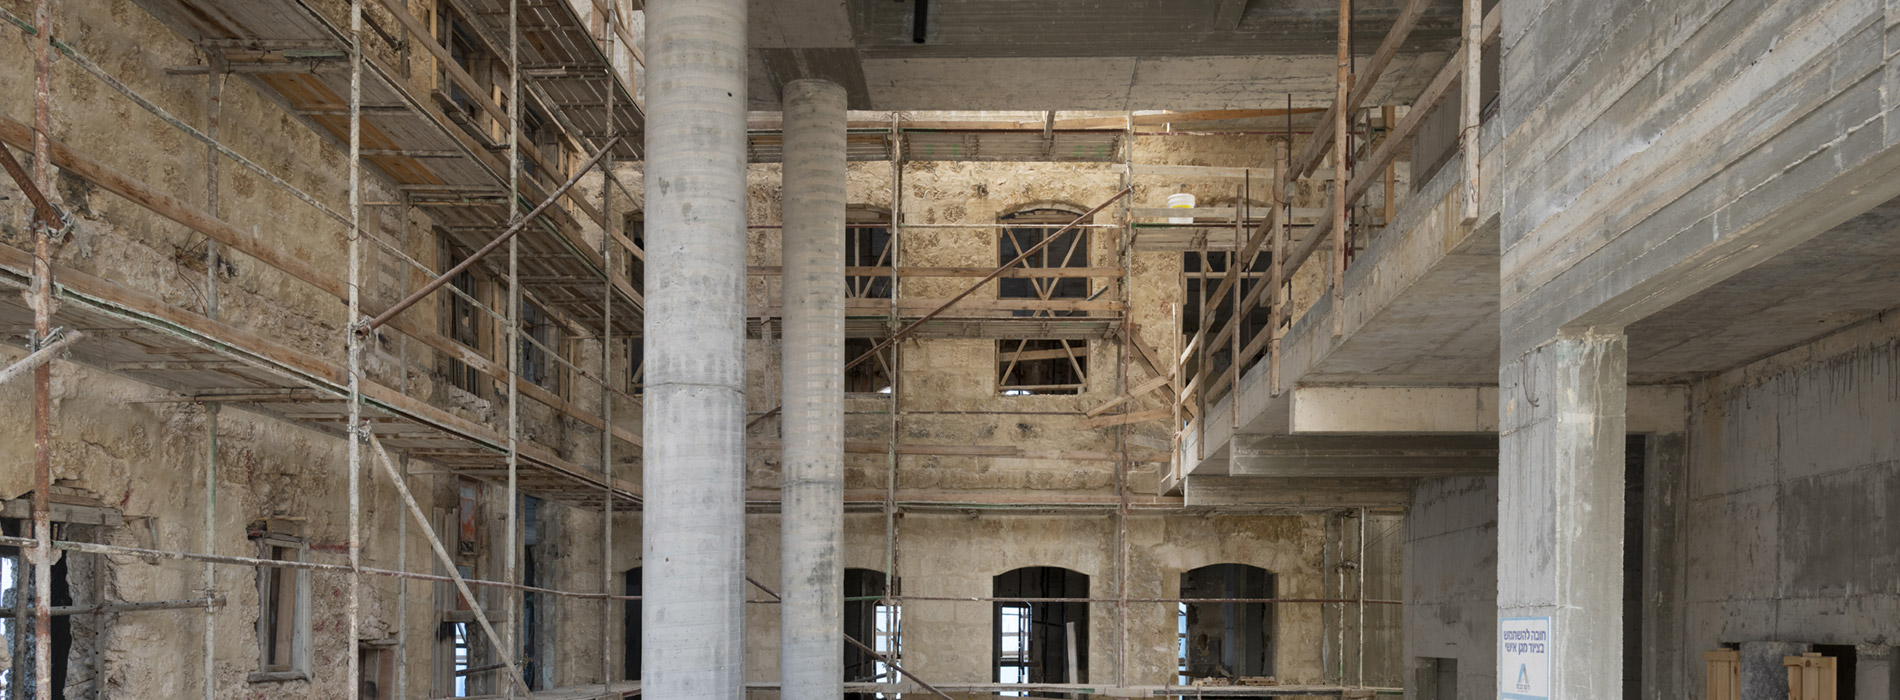 פרויקט מלון אלקונין